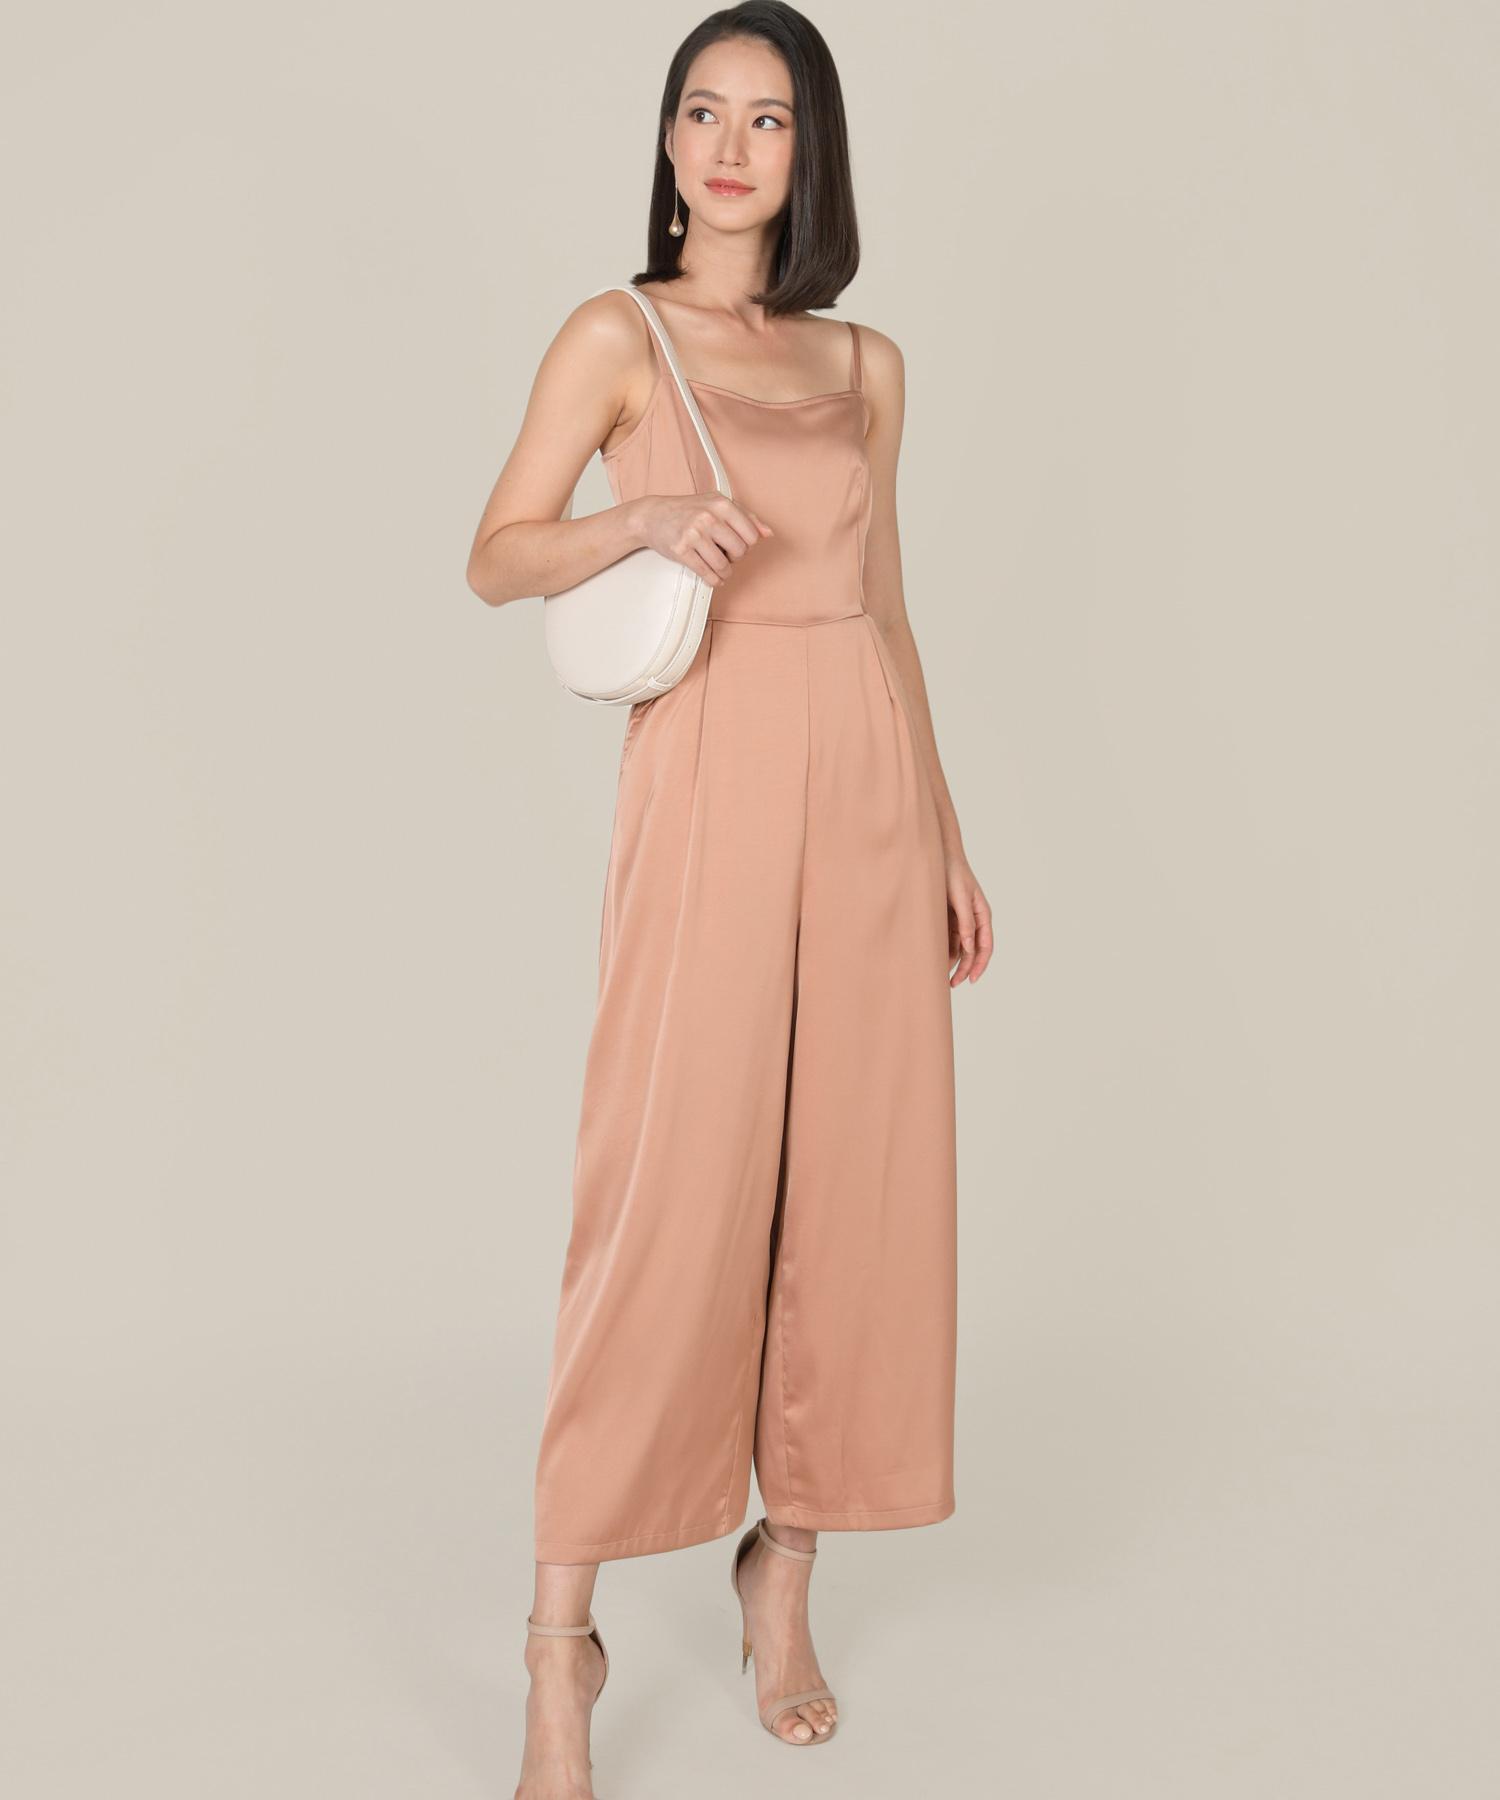 glossier-satin-jumpsuit-rose-gold-1